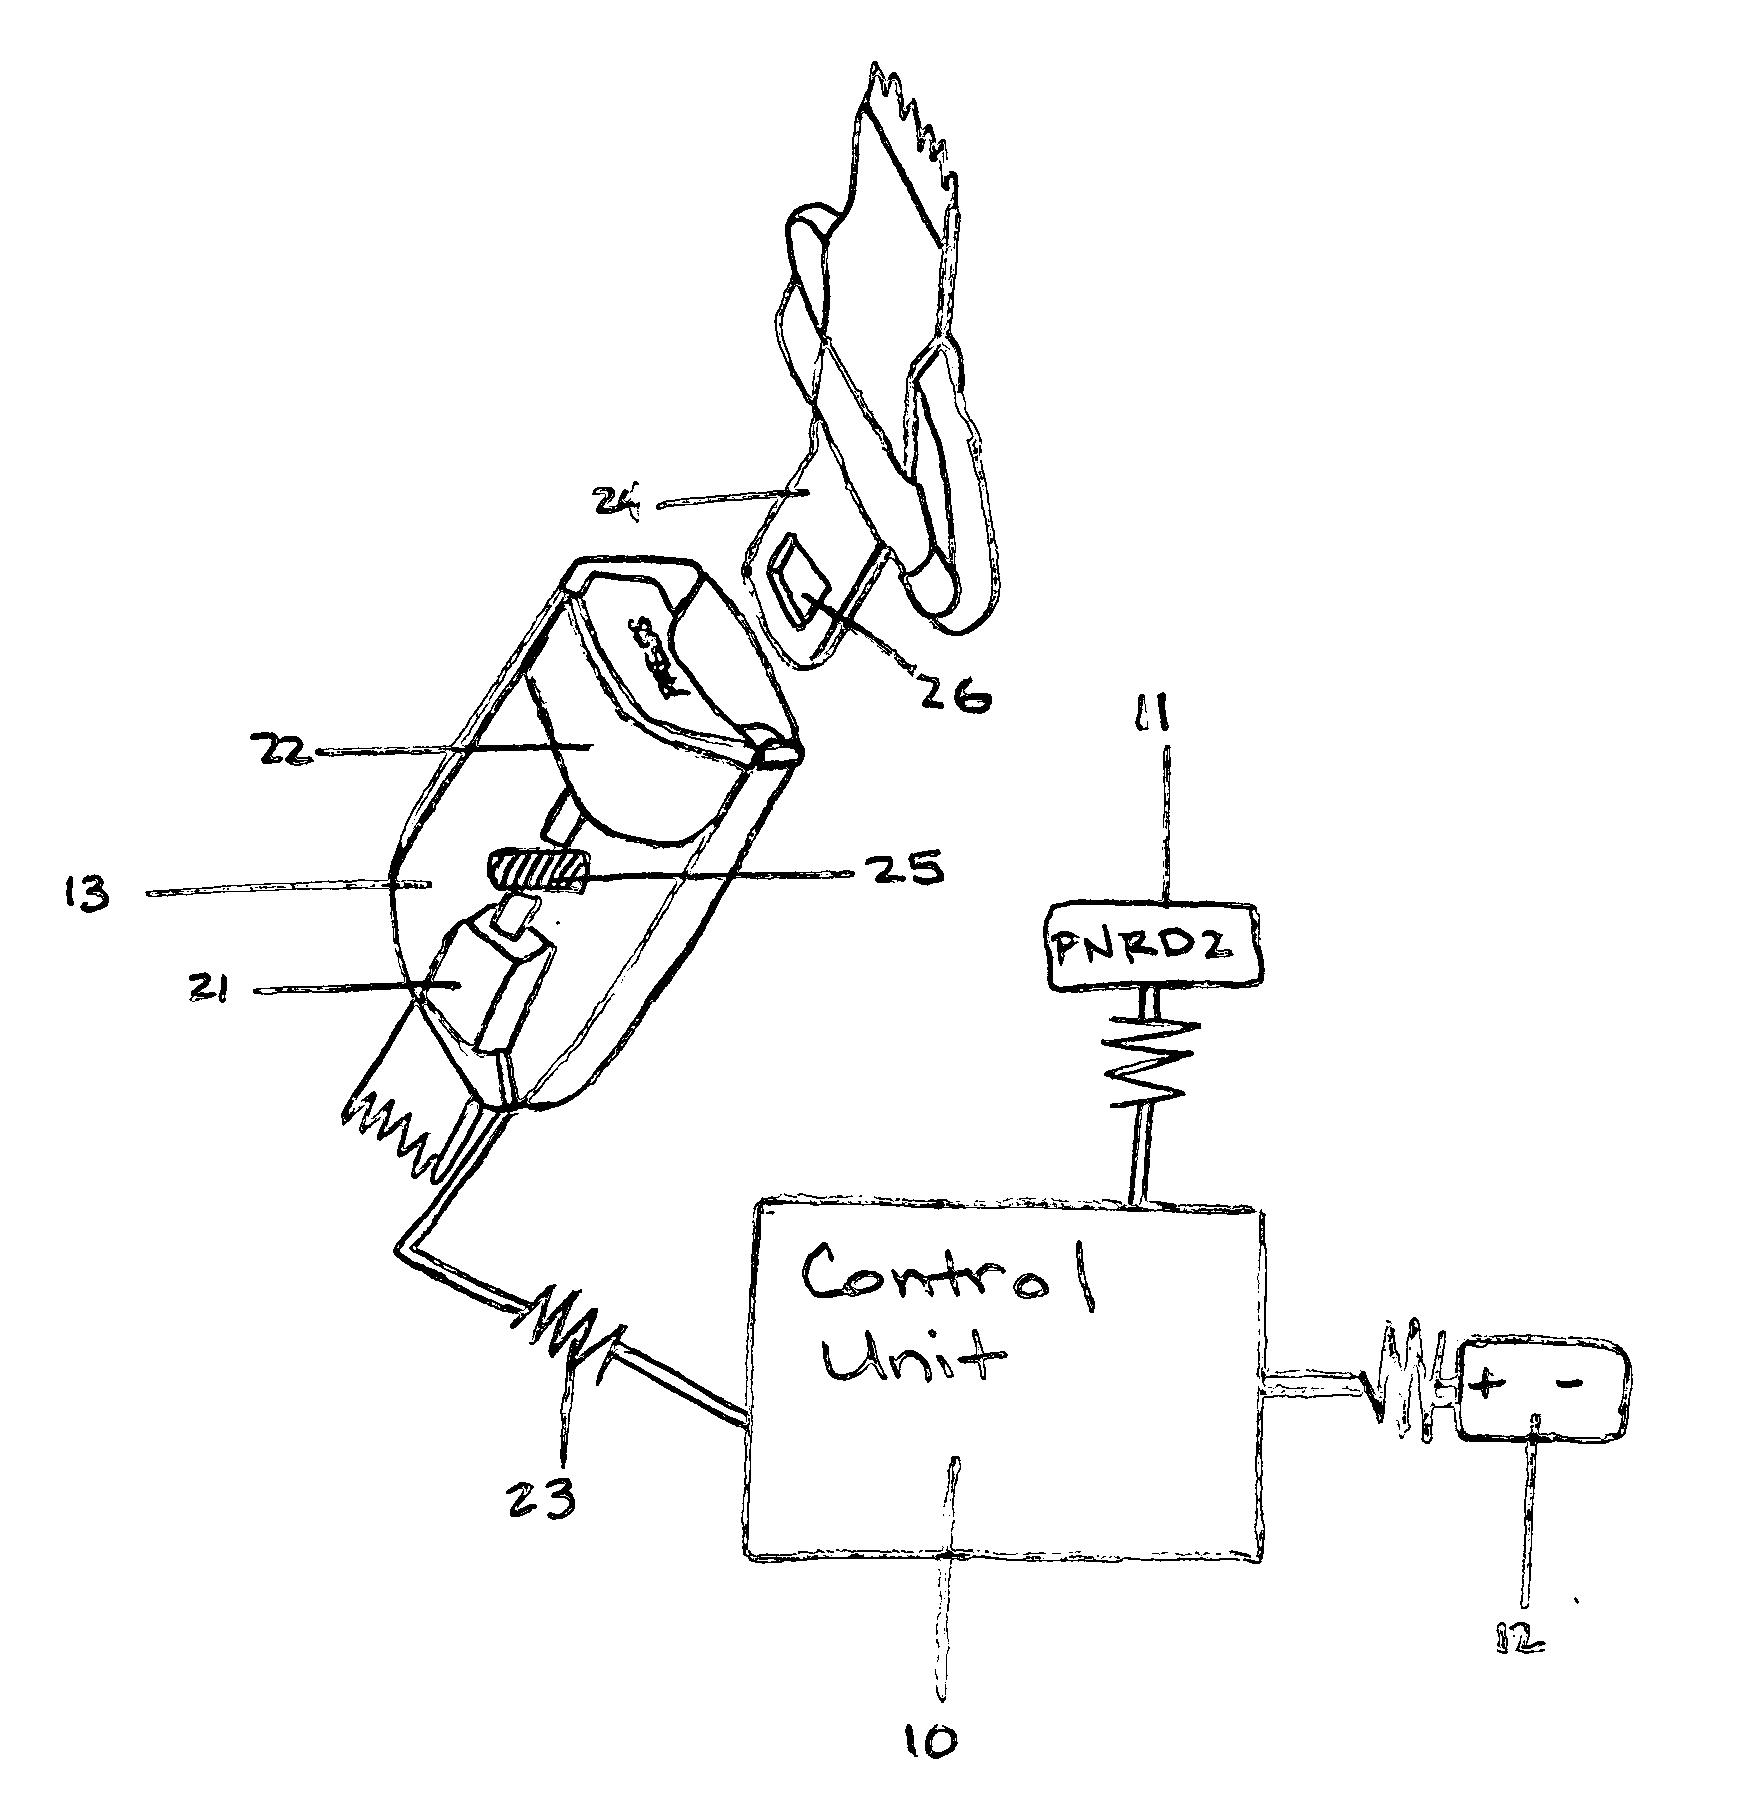 2006 ford mustang power seat wiring diagram